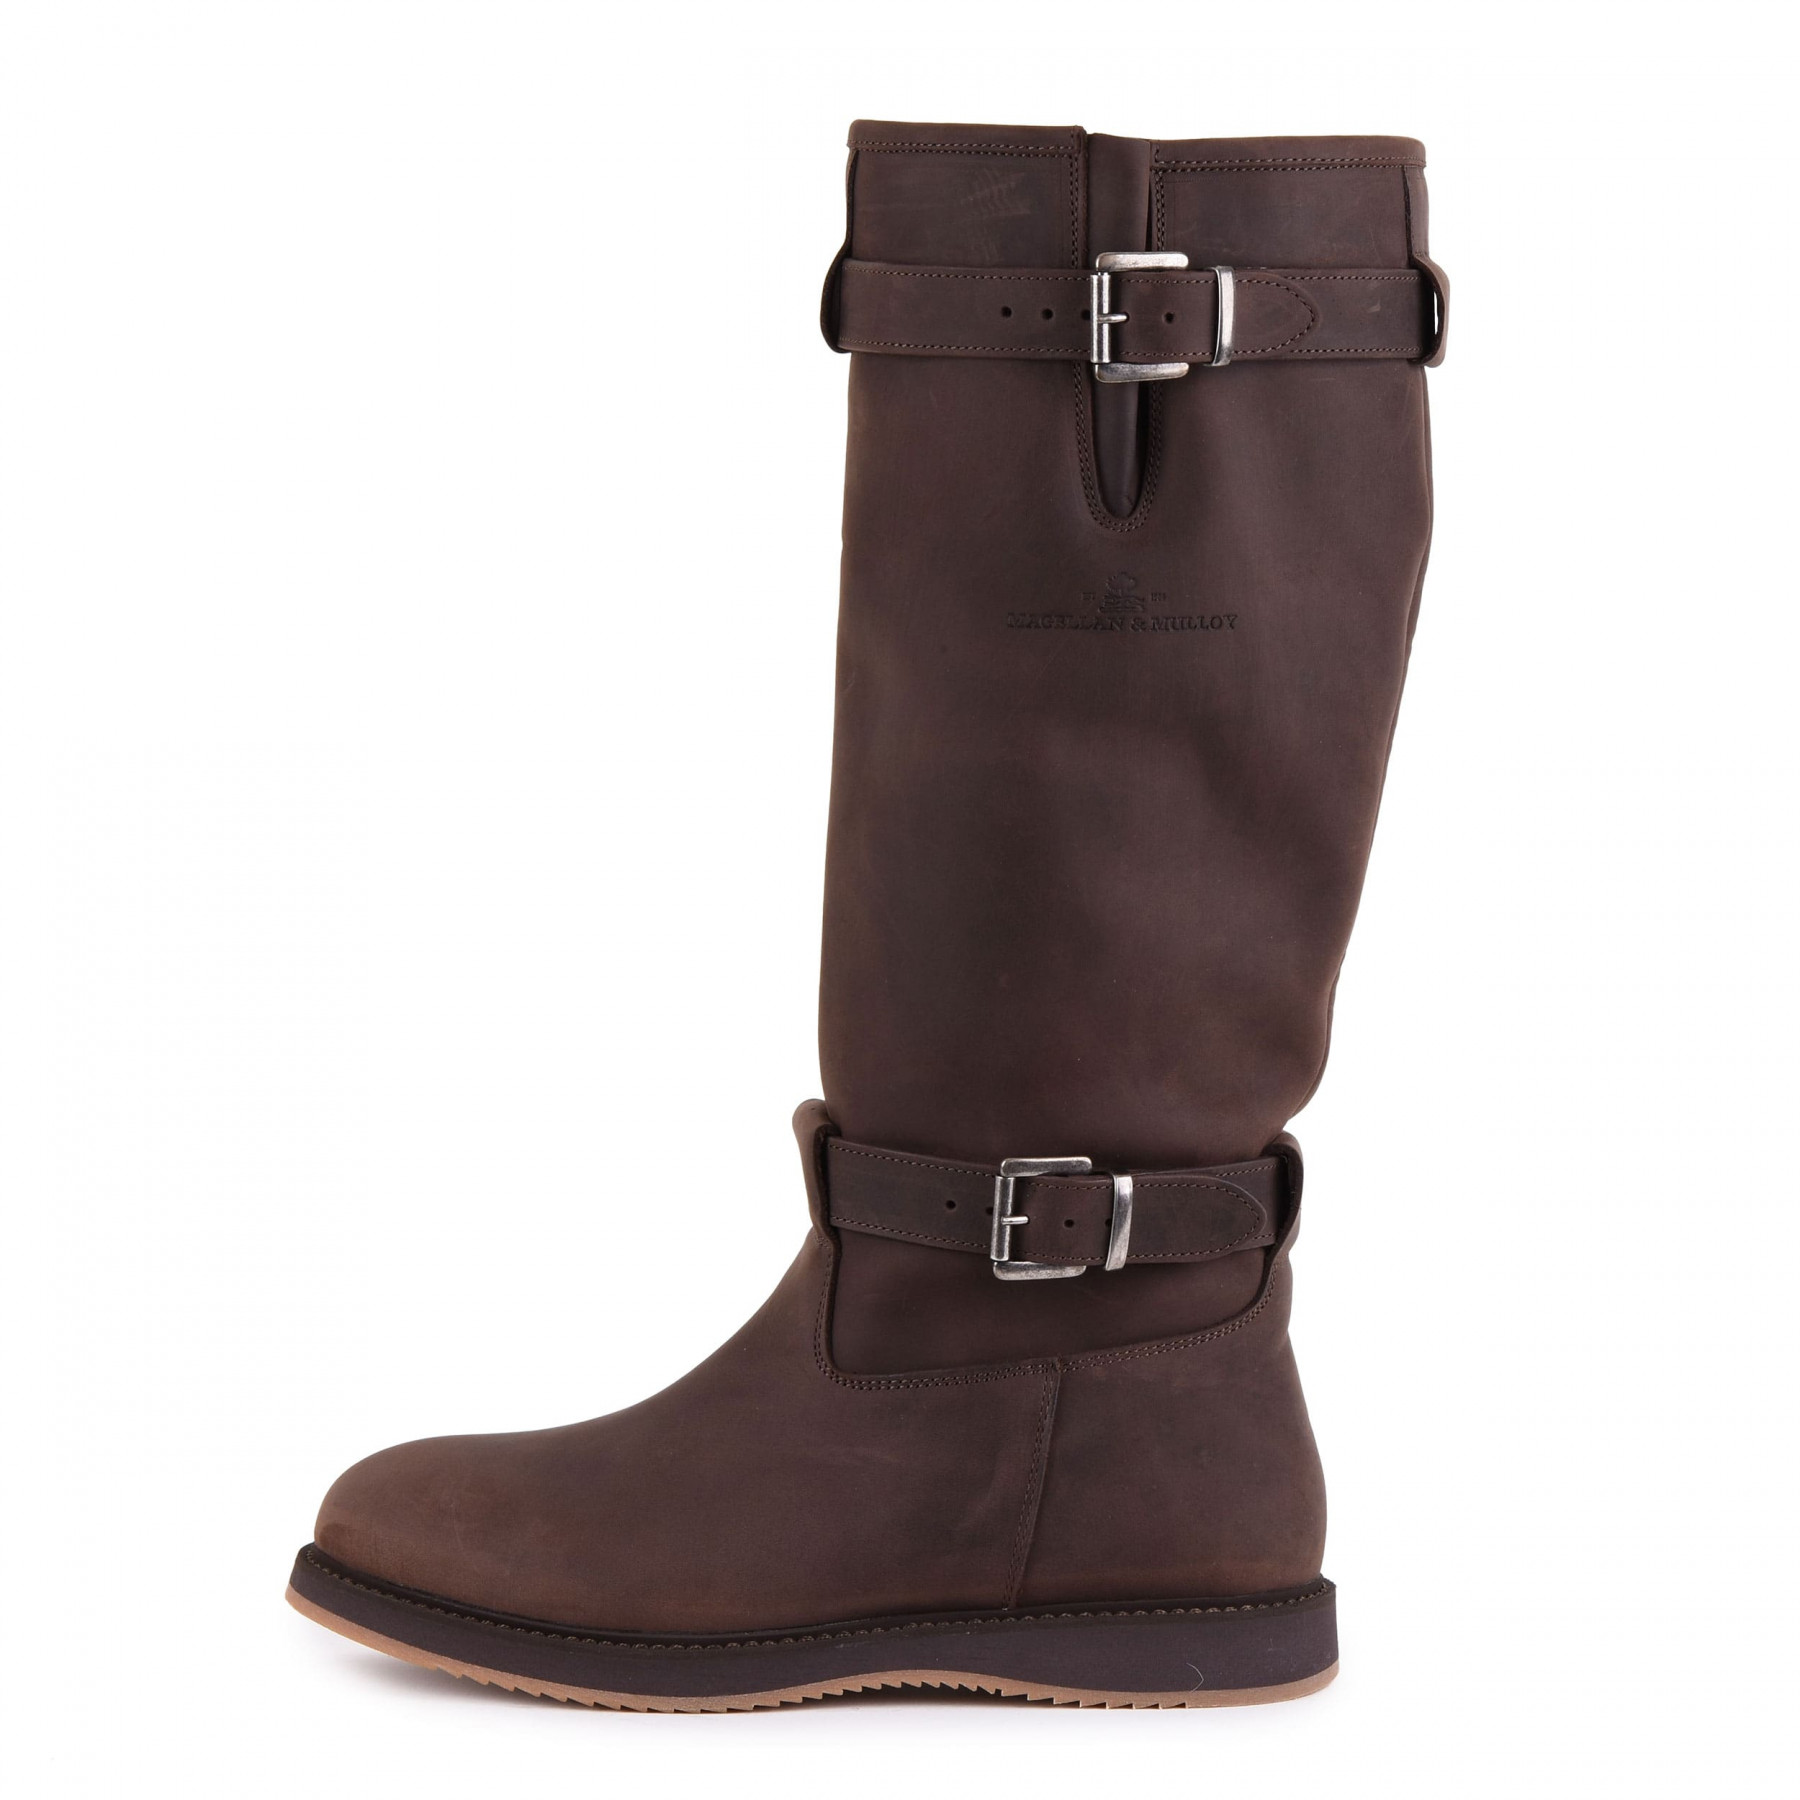 Magellan & Mulloy Xscape Denver Brown, dunkelbraune Damen Outdoor Stiefel